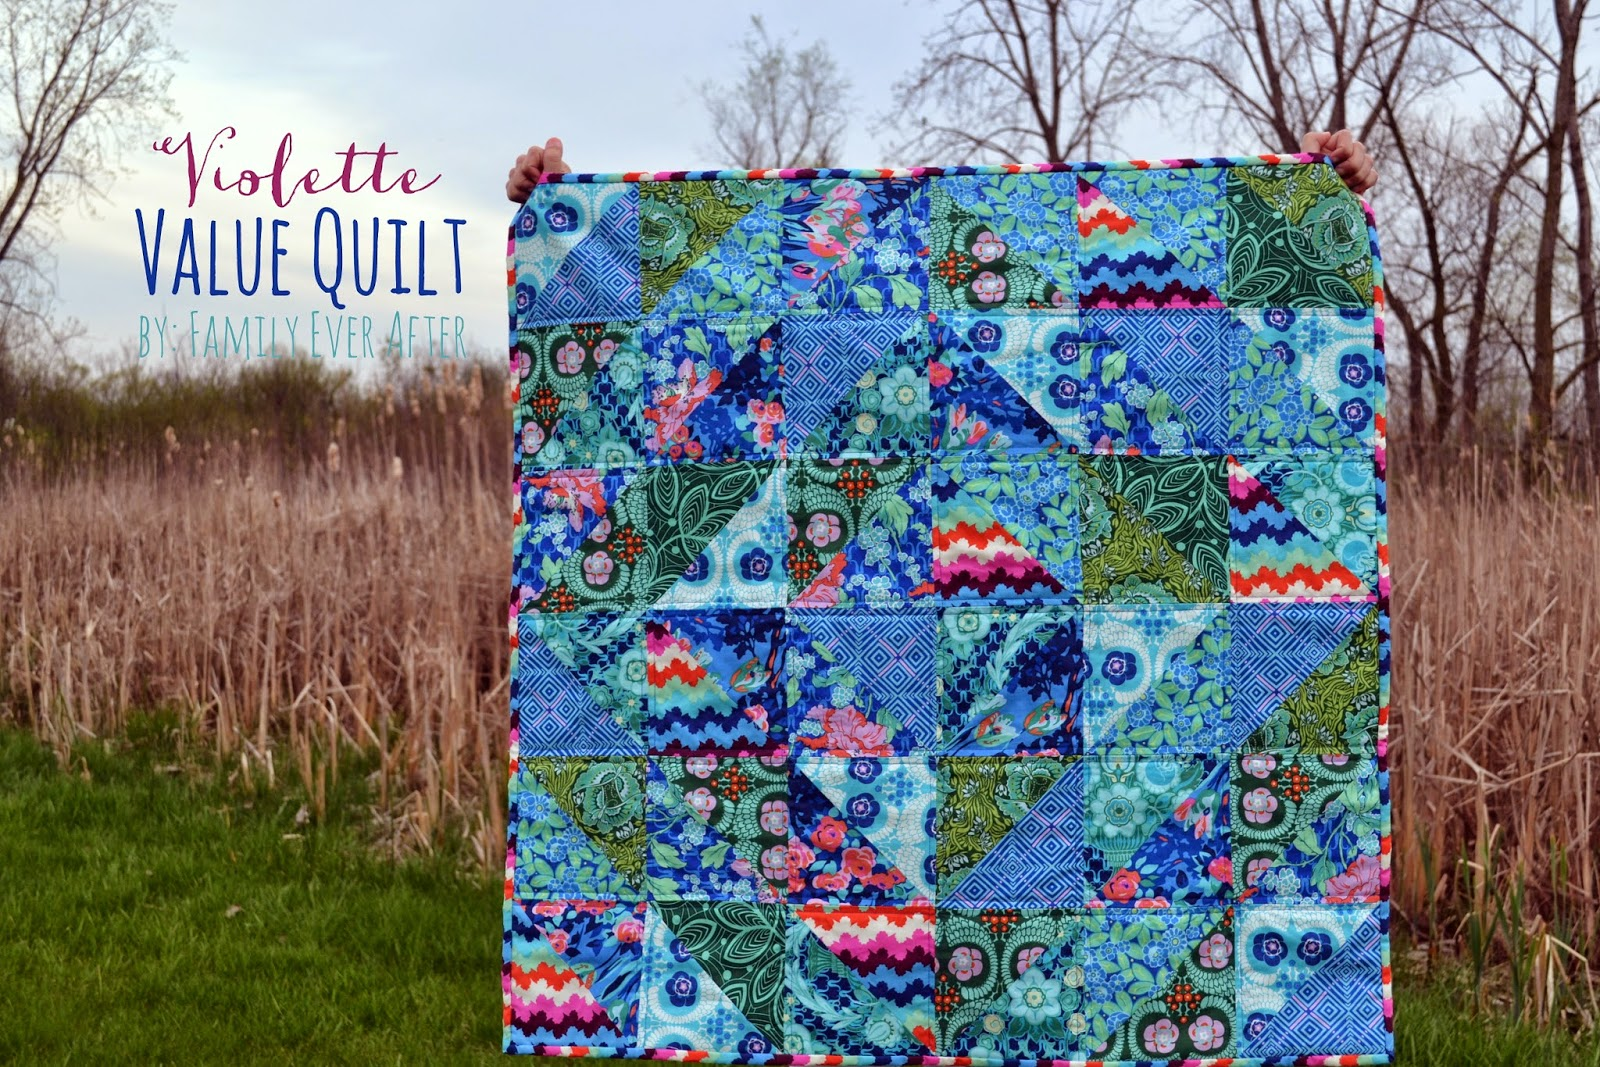 Violette Value Quilt